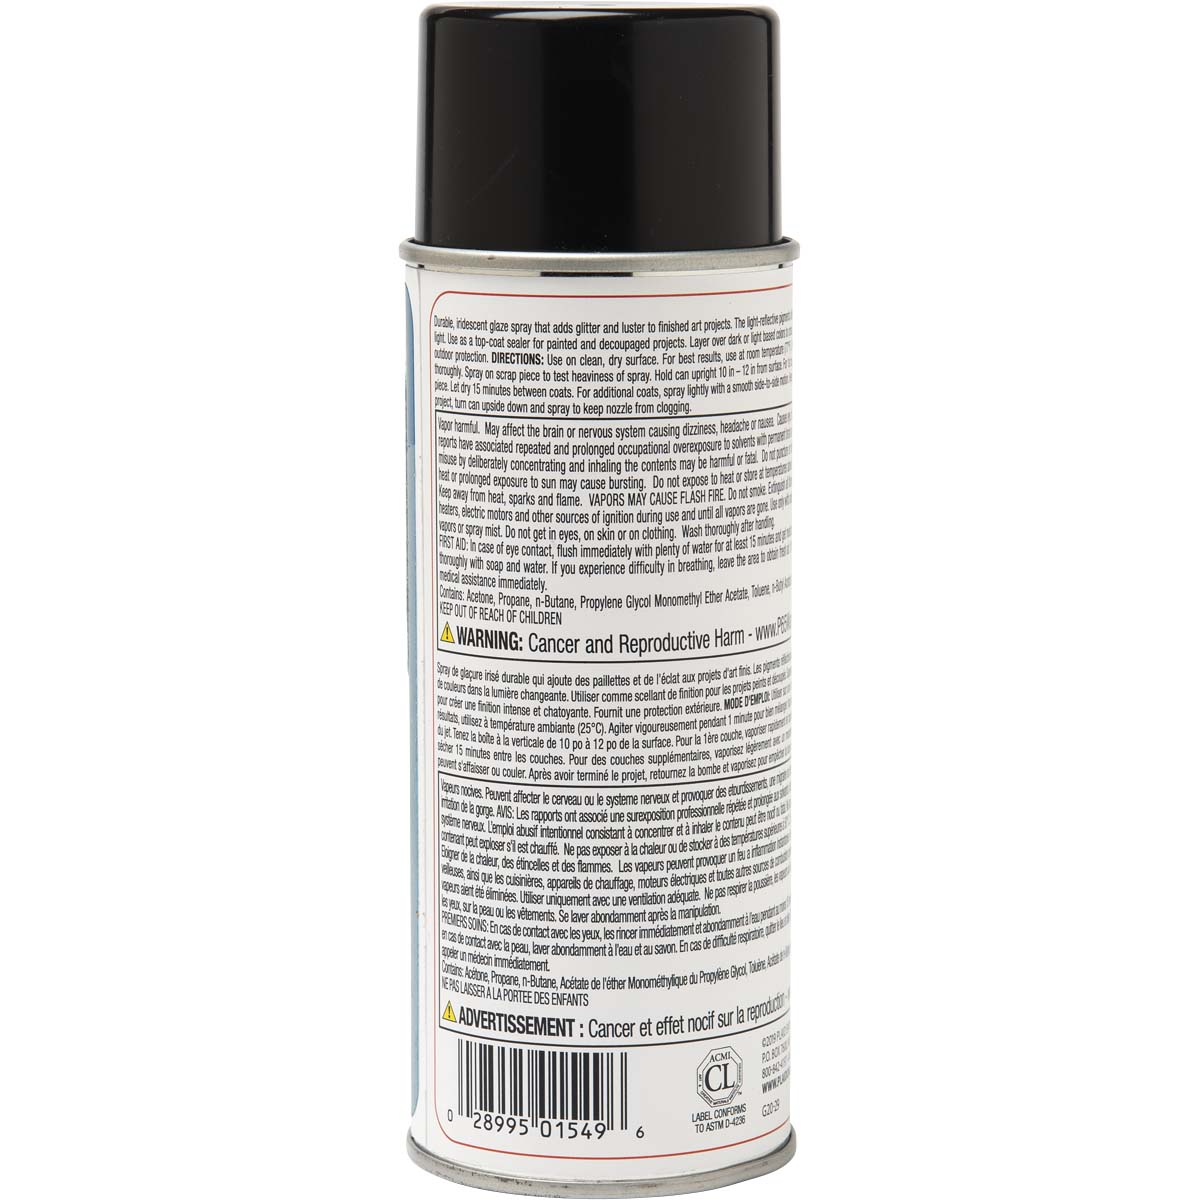 Mod Podge ® Iridescent Acrylic Sealer - Iridescent, 8 oz. - 1549